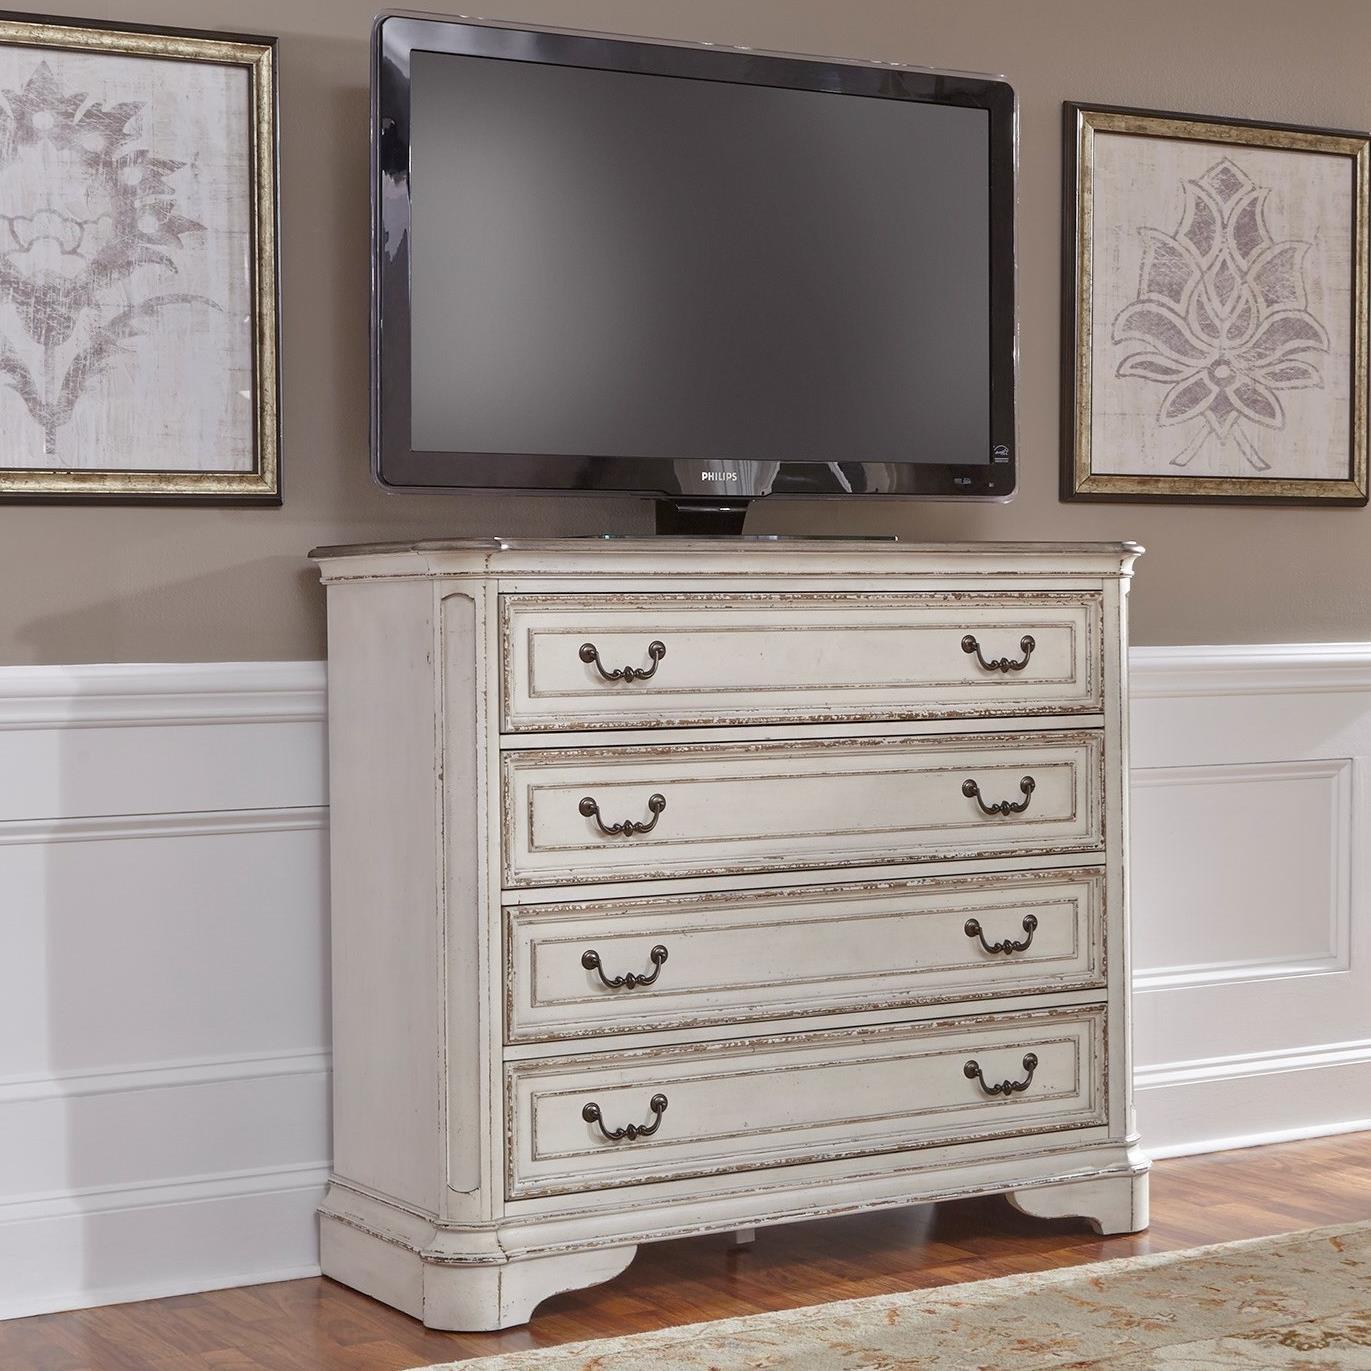 Magnolia Manor Media Chest by Sarah Randolph Designs at Virginia Furniture Market